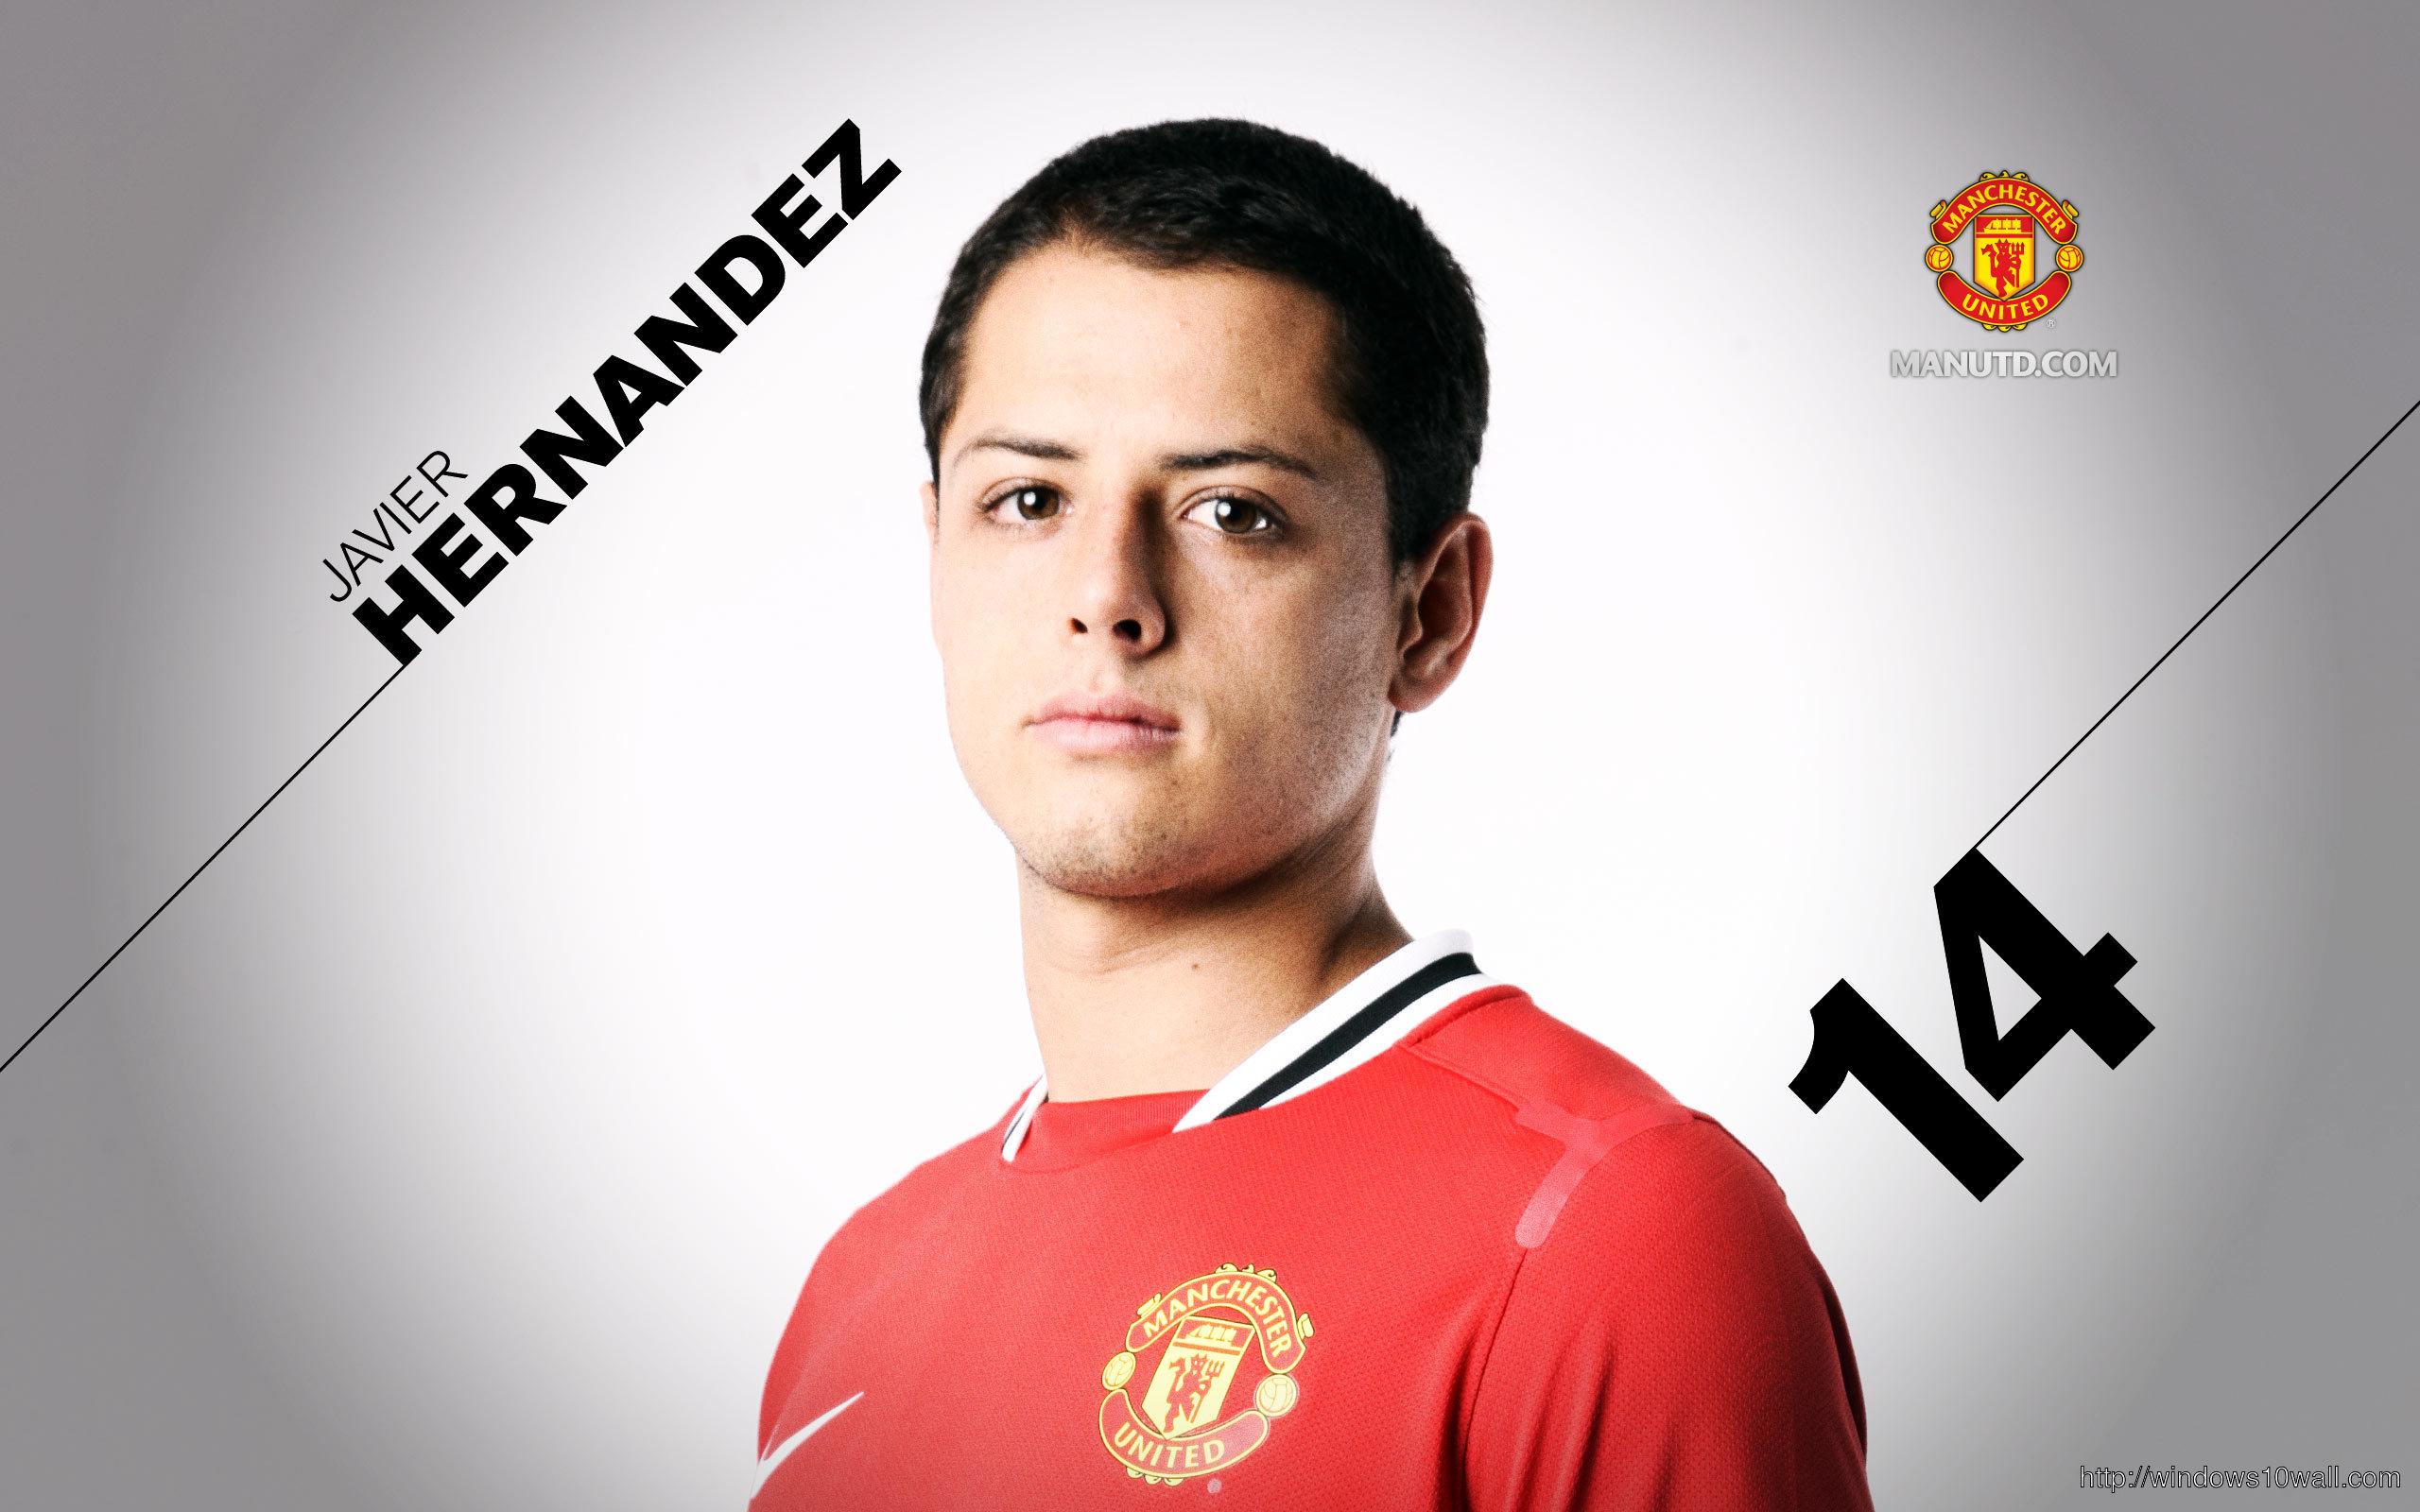 Chicharito Manchester United Background Wallpaper